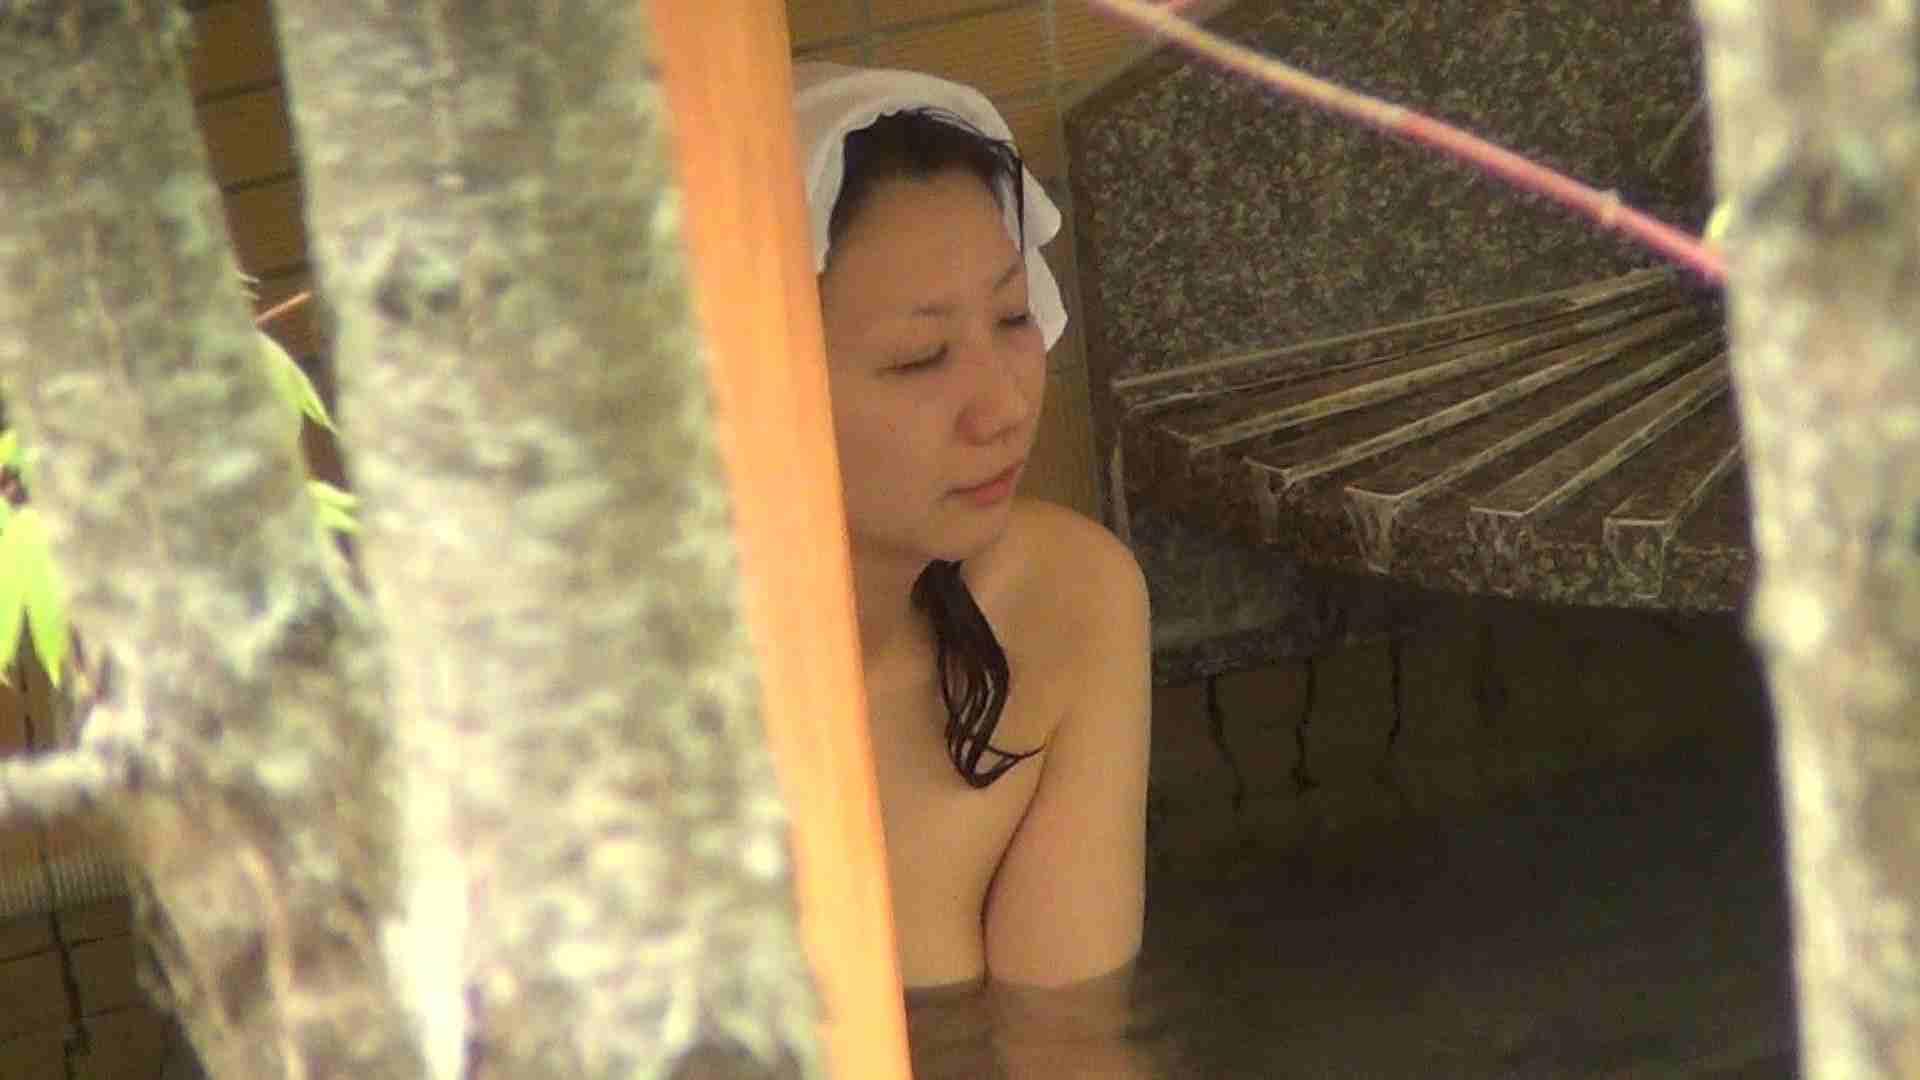 Aquaな露天風呂Vol.231 露天 スケベ動画紹介 113pic 23